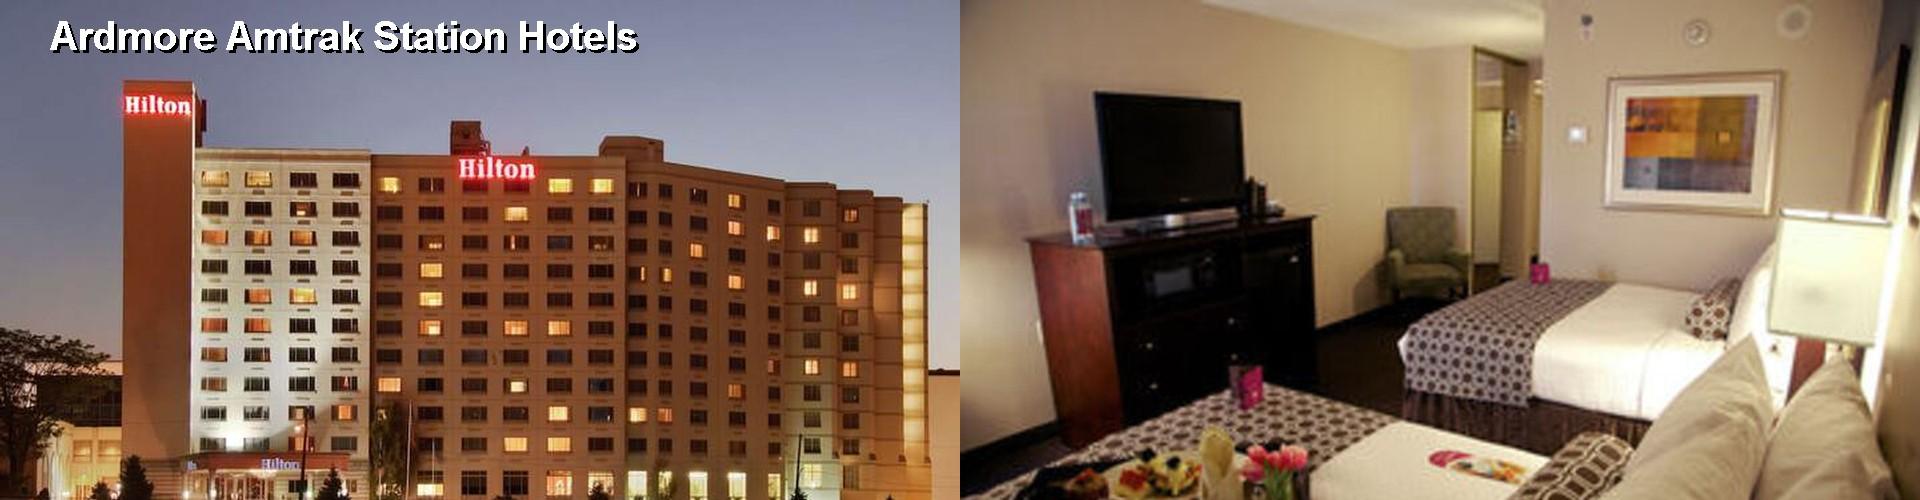 5 Best Hotels Near Ardmore Amtrak Station